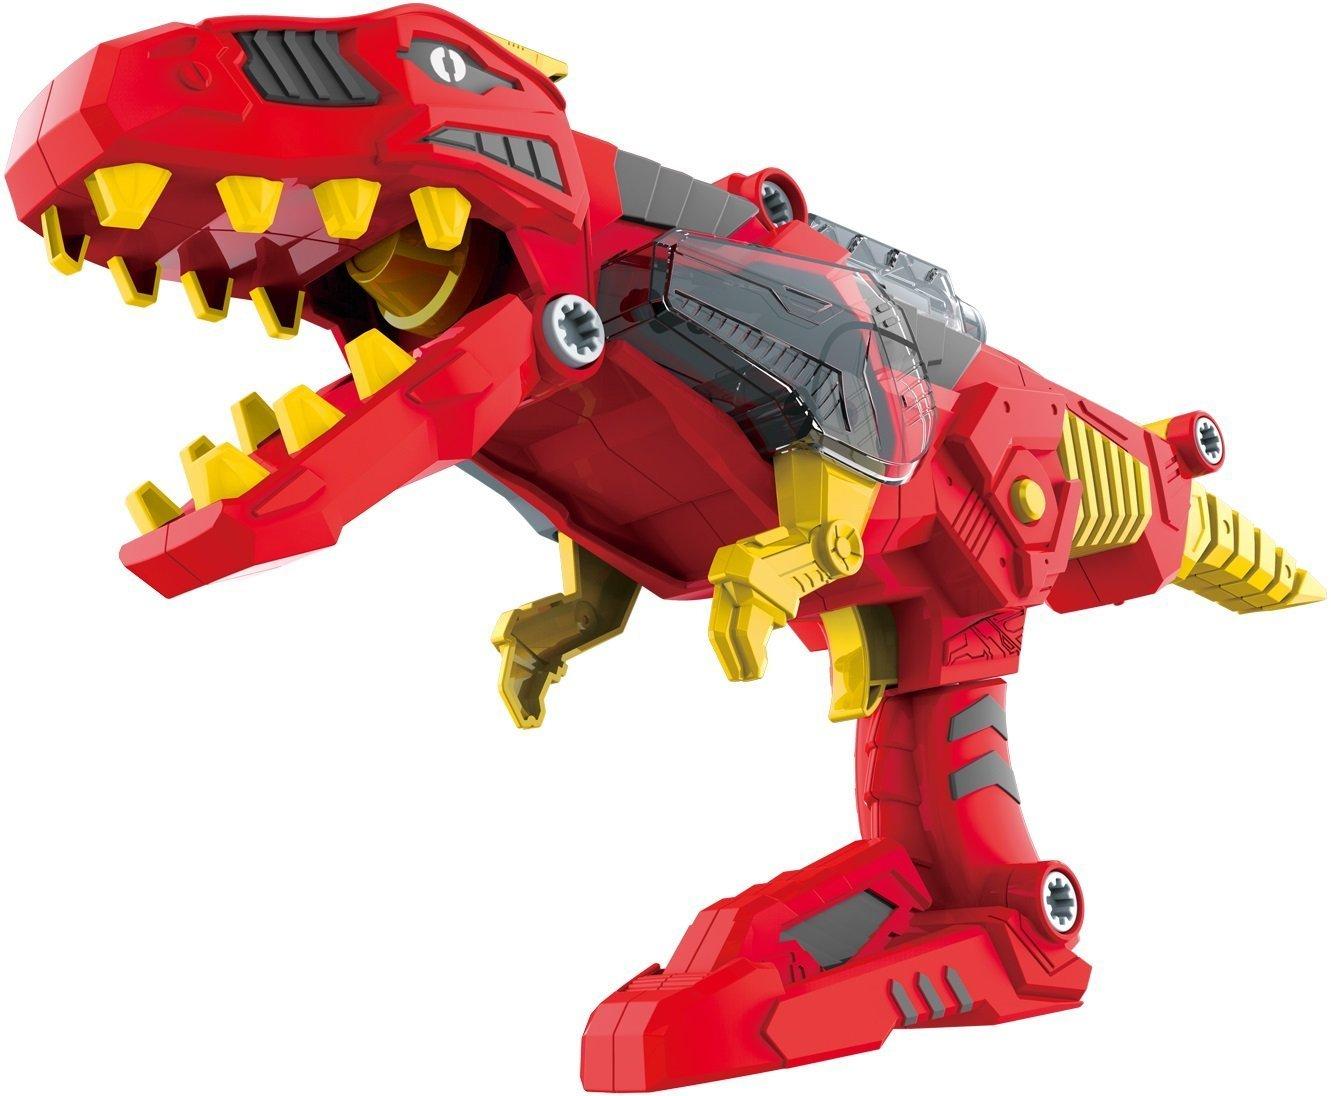 3-in-1 Dinoblaster Transforming Dinosaur Gun Engineering Take Apart Toy Tool Kit with Lights & Sound (Tyrannosaurus Rex)